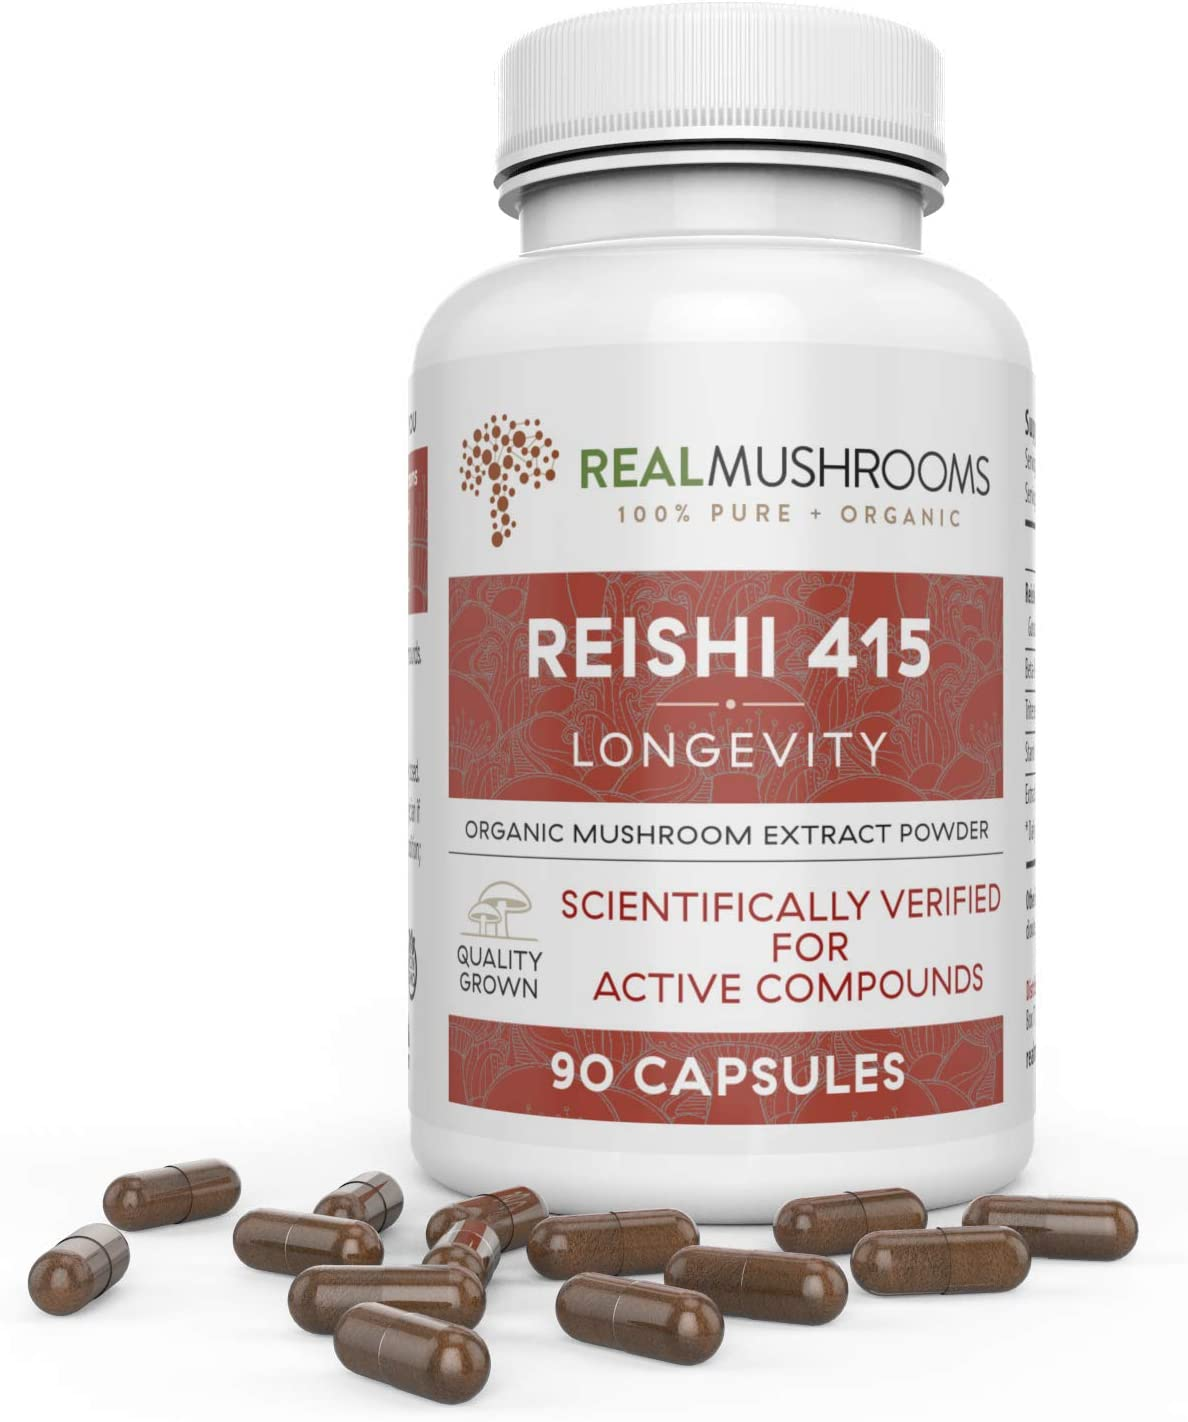 Organic Reishi Mushroom Extract by Real Mushrooms – 90 Capsules – Ganoderma Lucidum Ling Zhi – Immune Booster